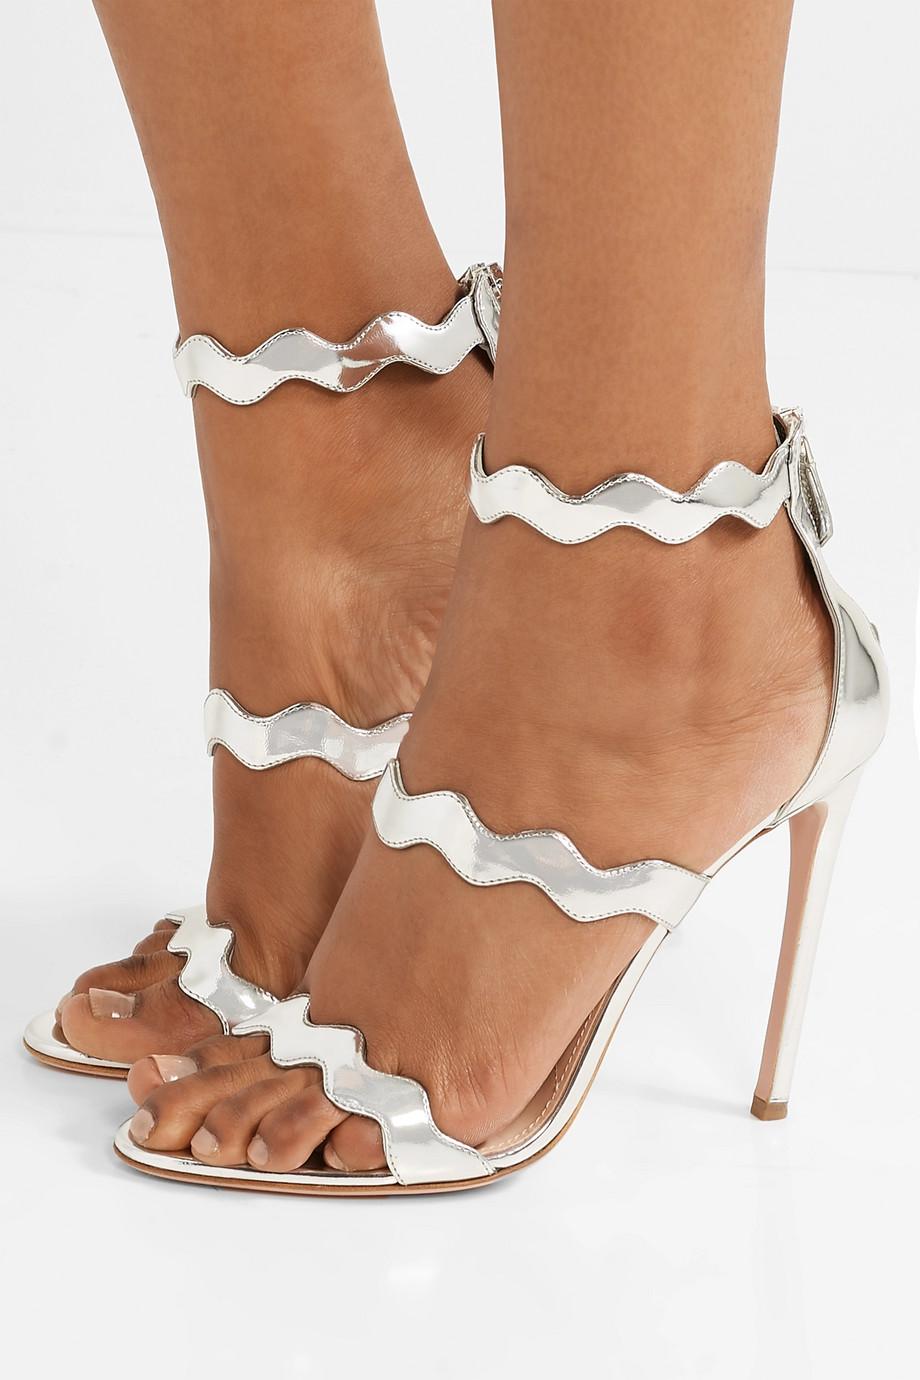 Prada 115 scalloped metallic leather sandals